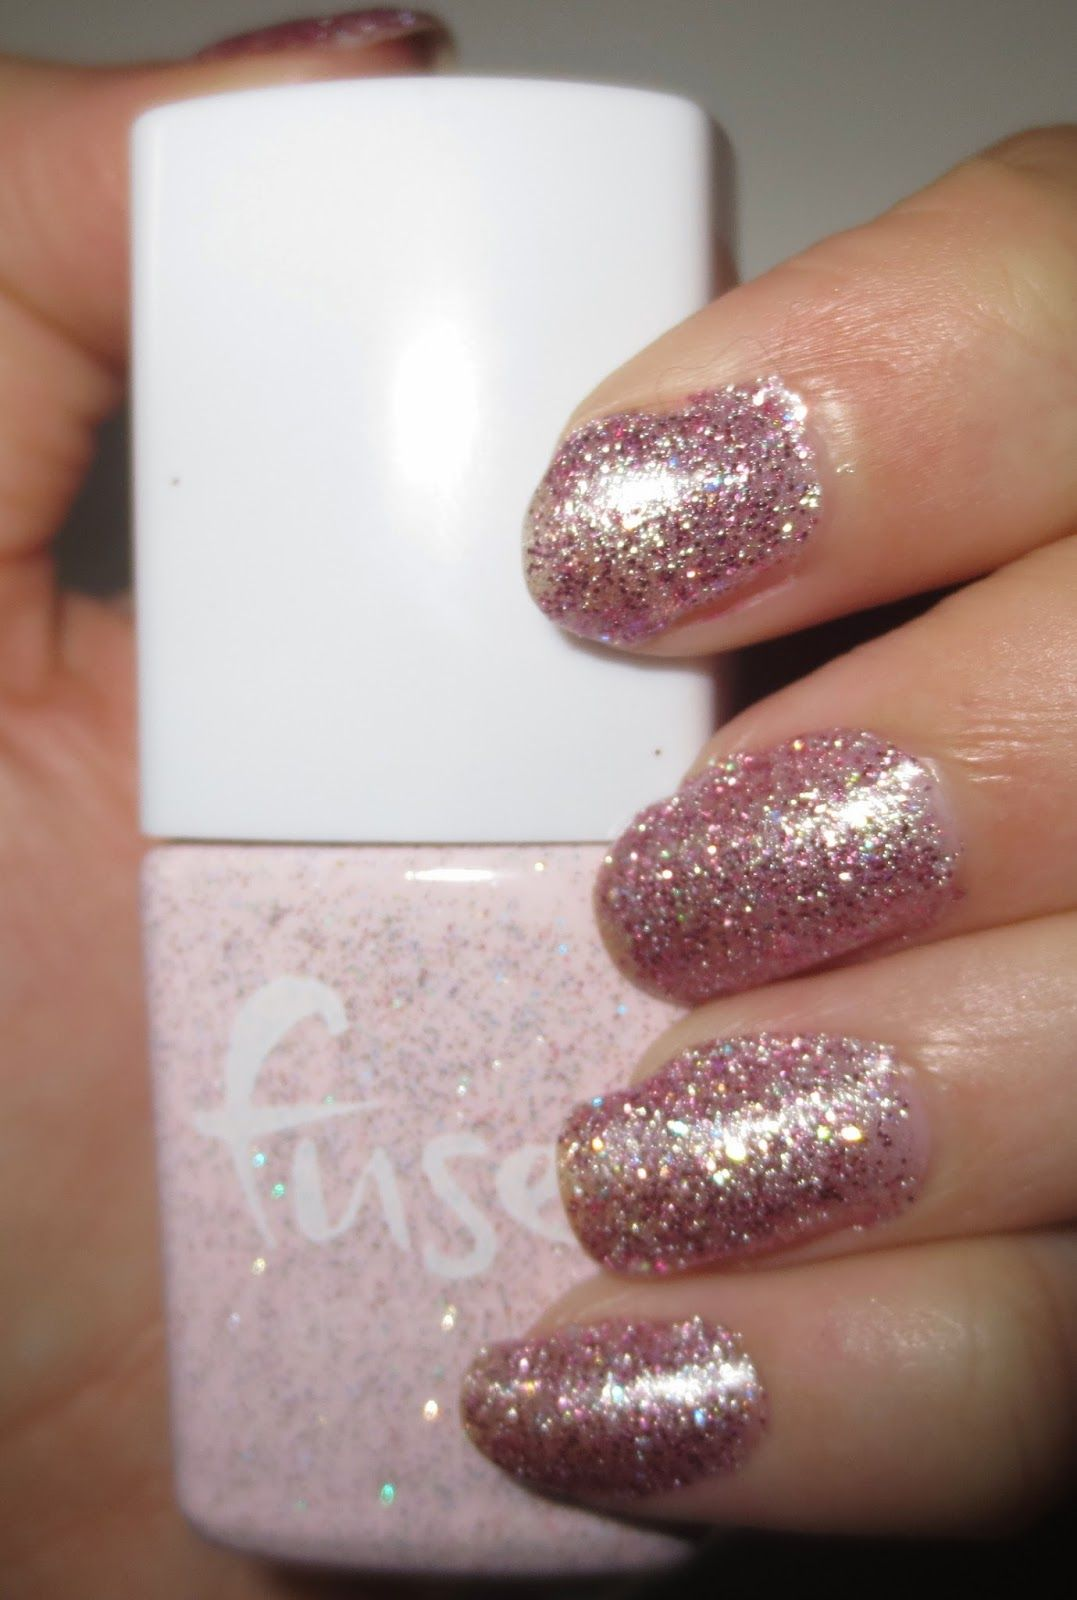 Fuse Gelnamel in Gone Fission | Nail Polish | Pinterest | Lips